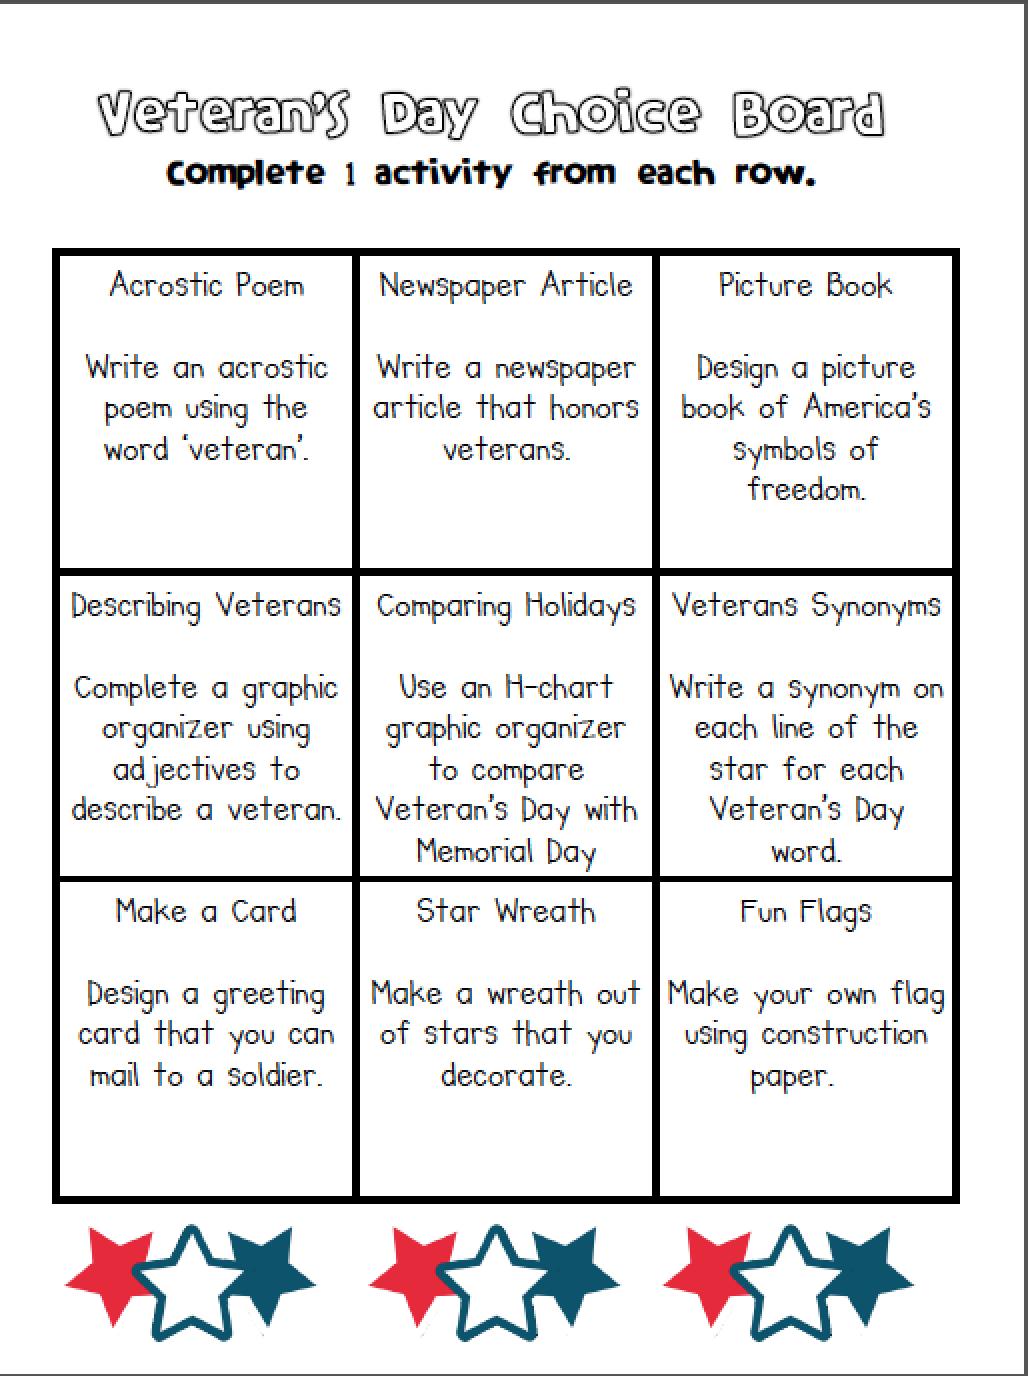 educationjourney: Veteran's Day Choice Board   Veterans day [ 1376 x 1028 Pixel ]